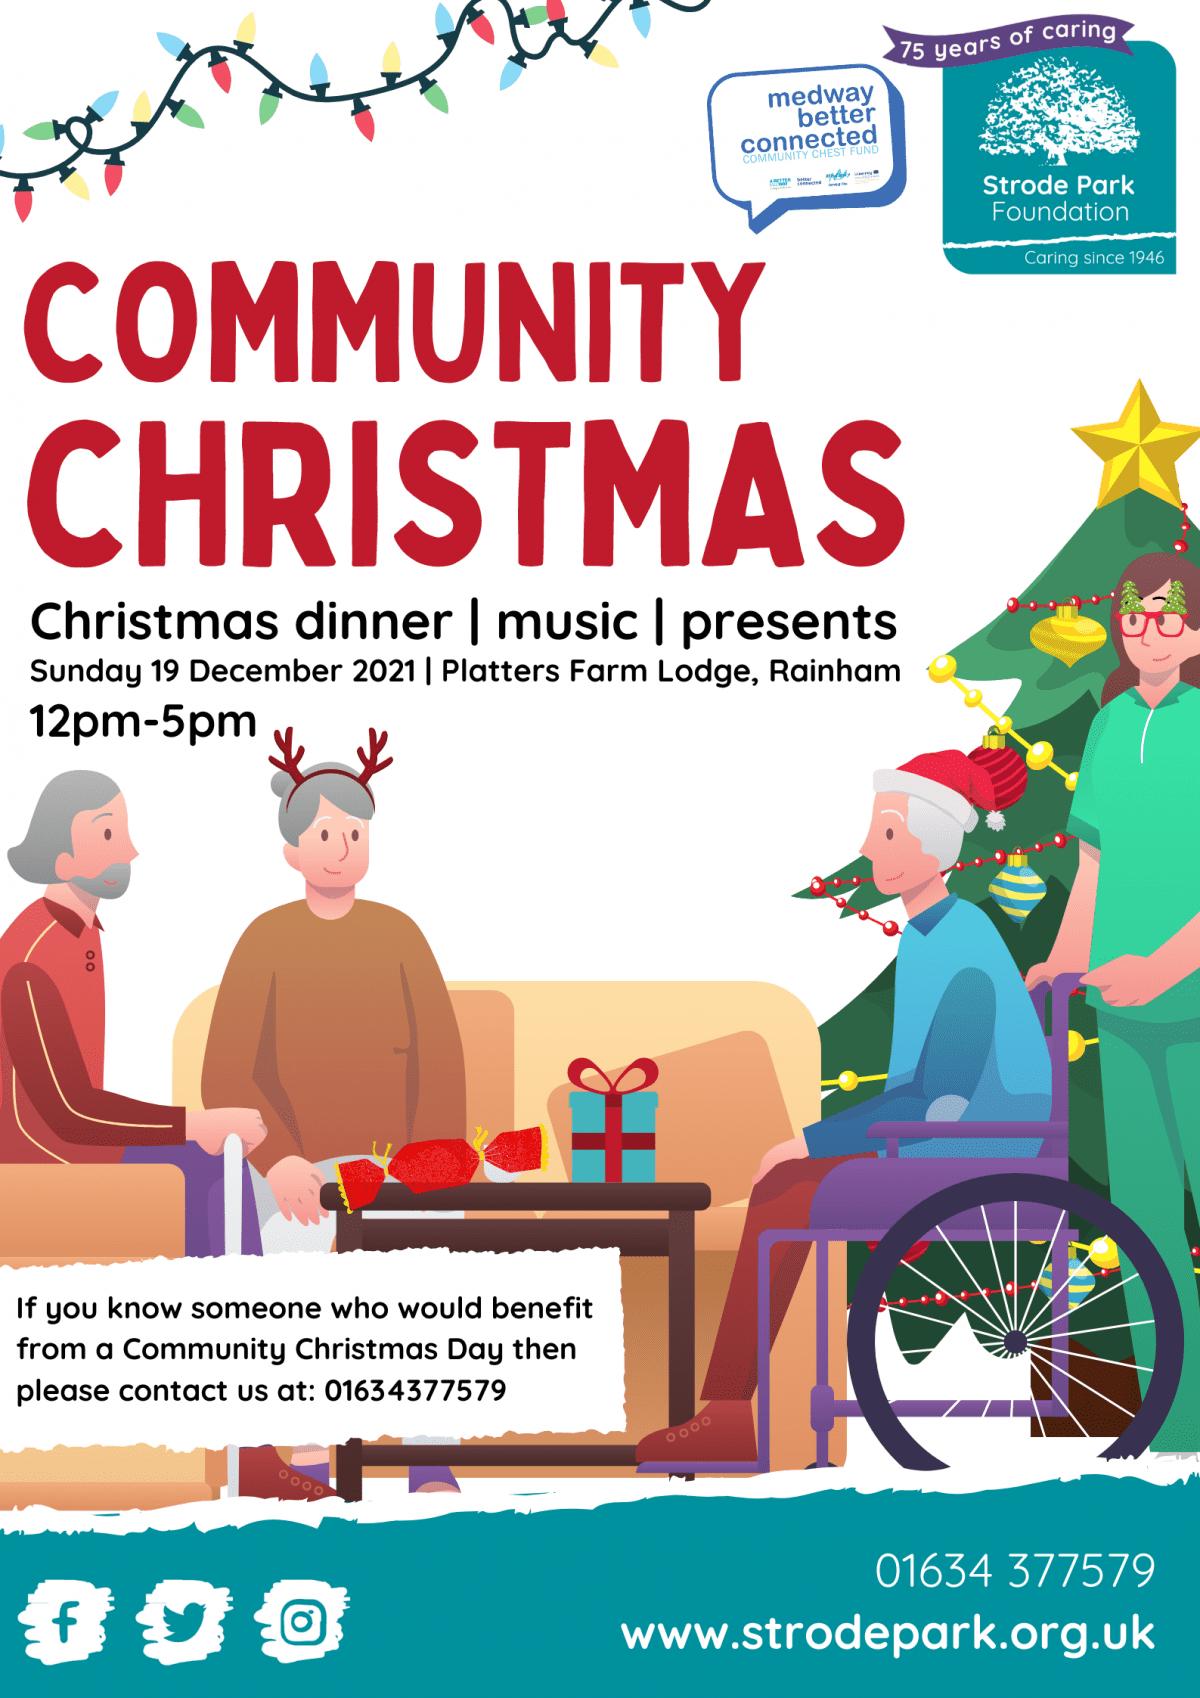 Community Christmas at Platters Farm Lodge